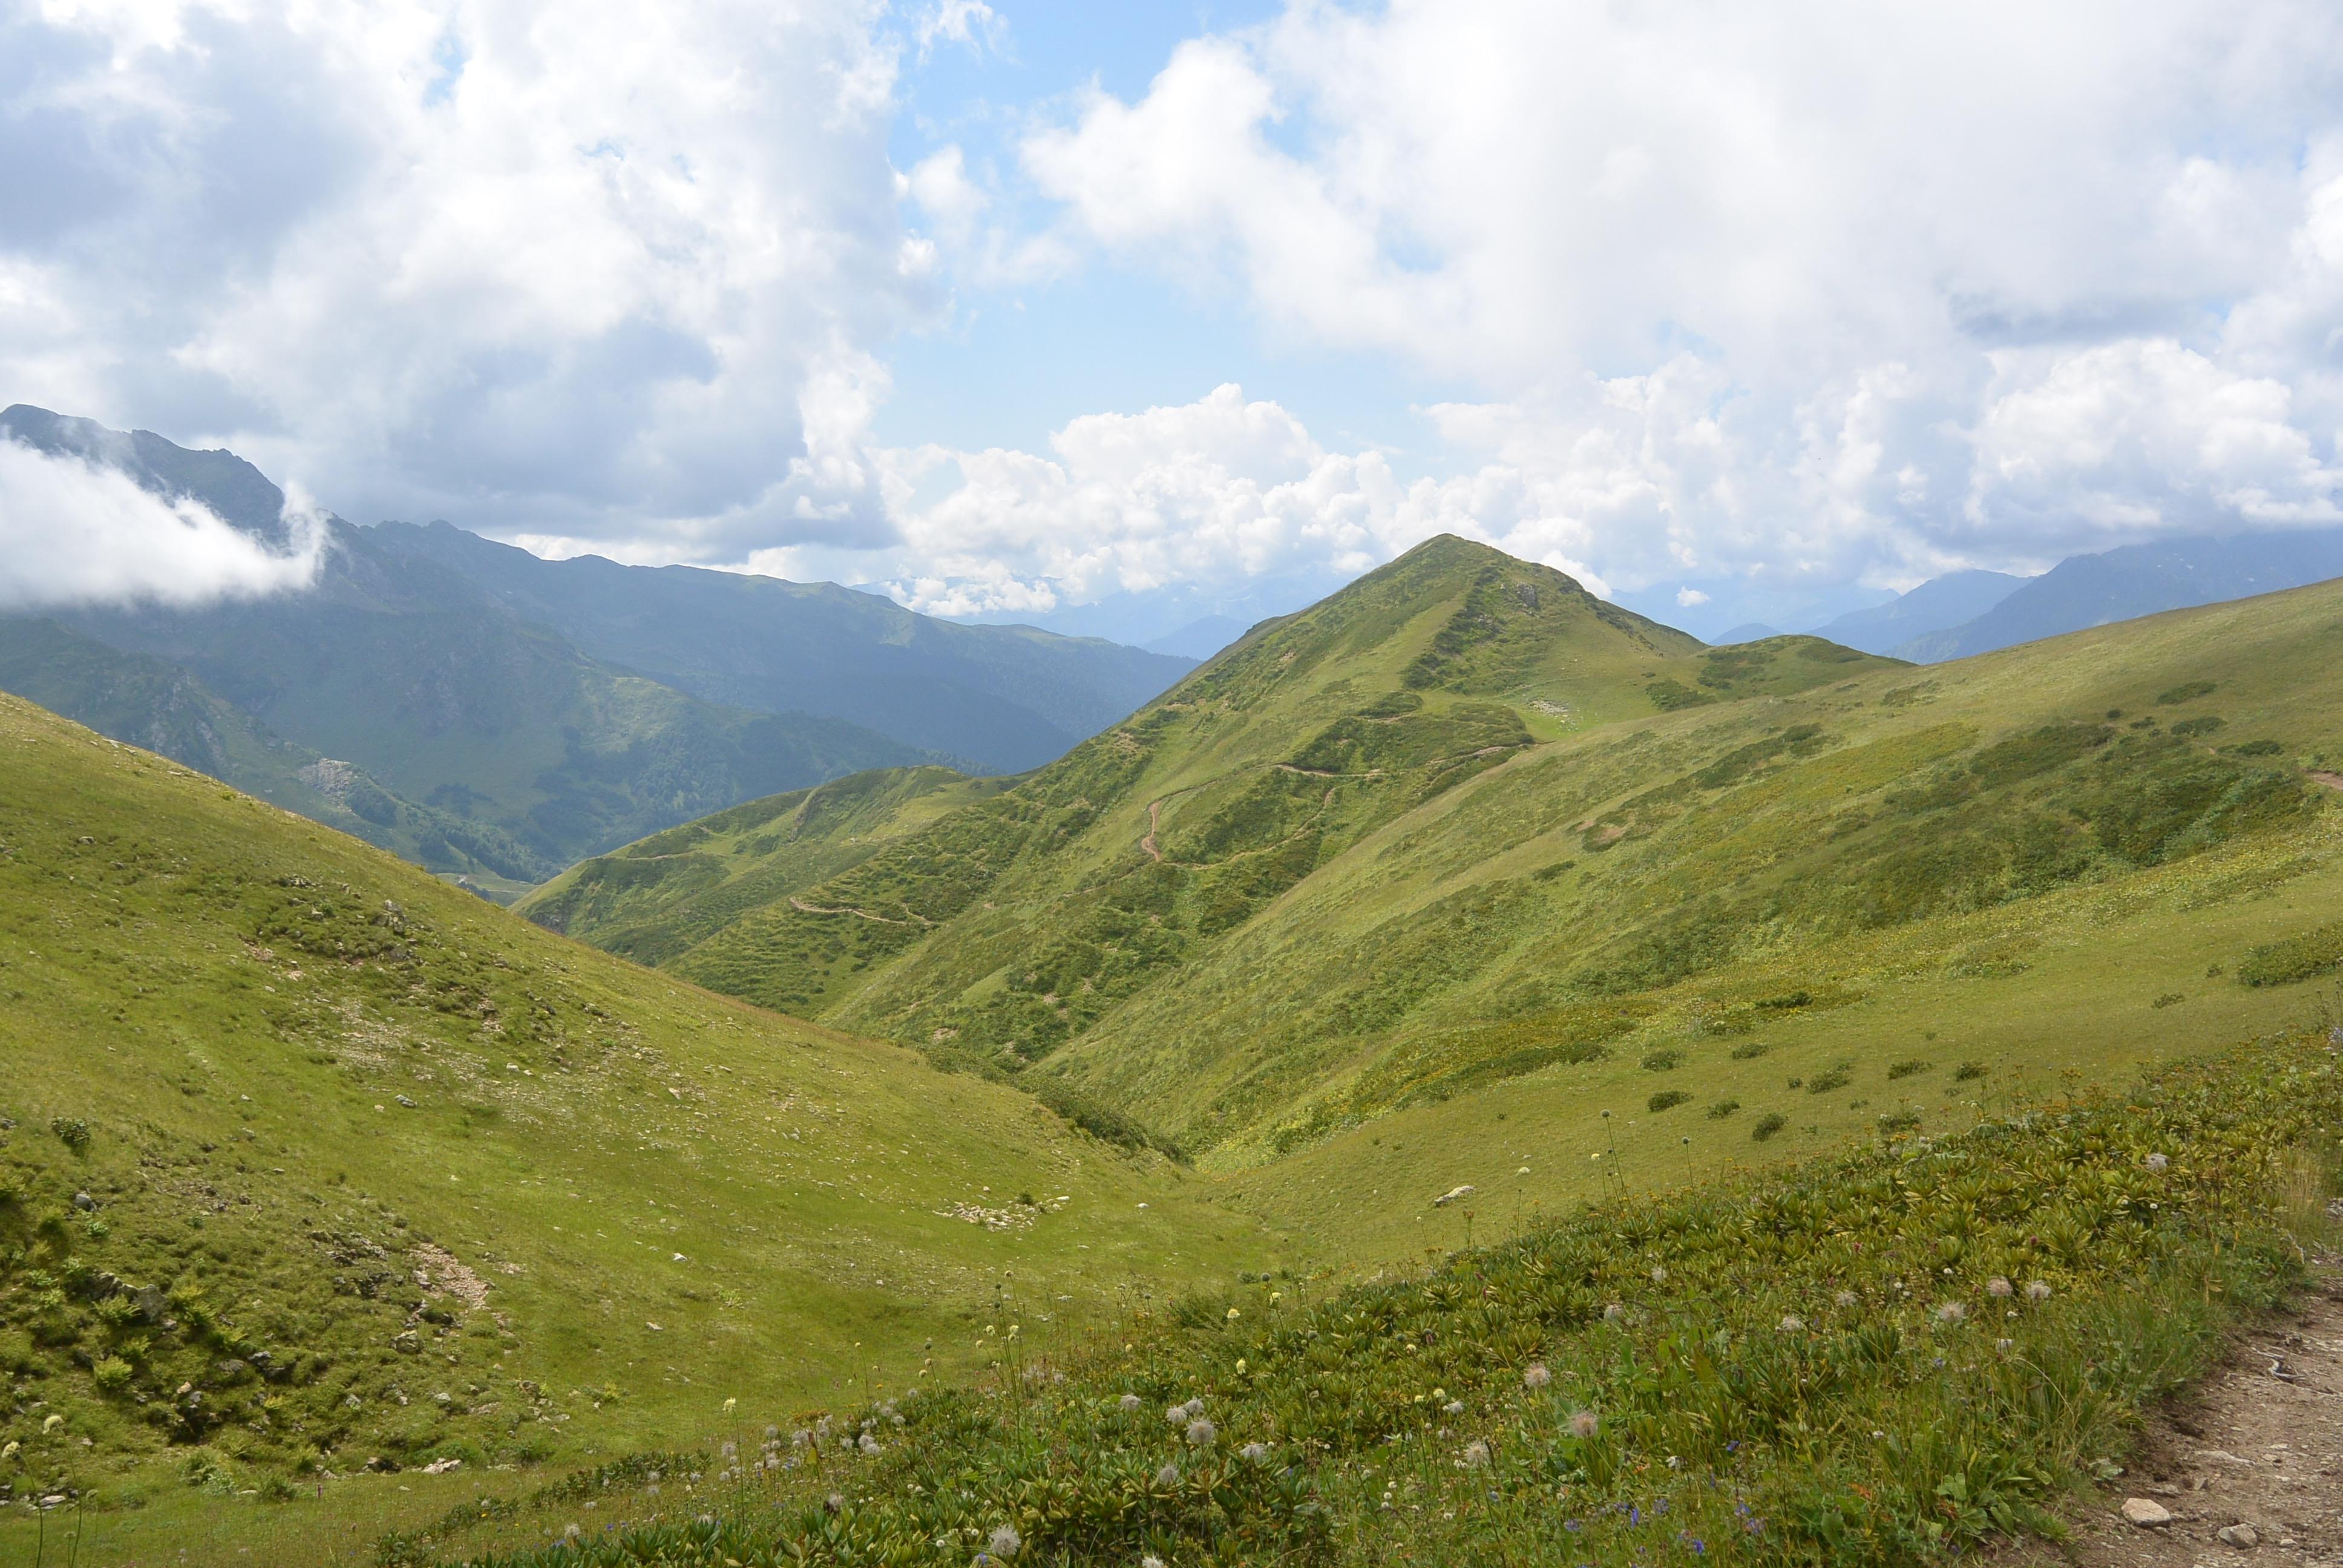 РРНП, Ауадхара